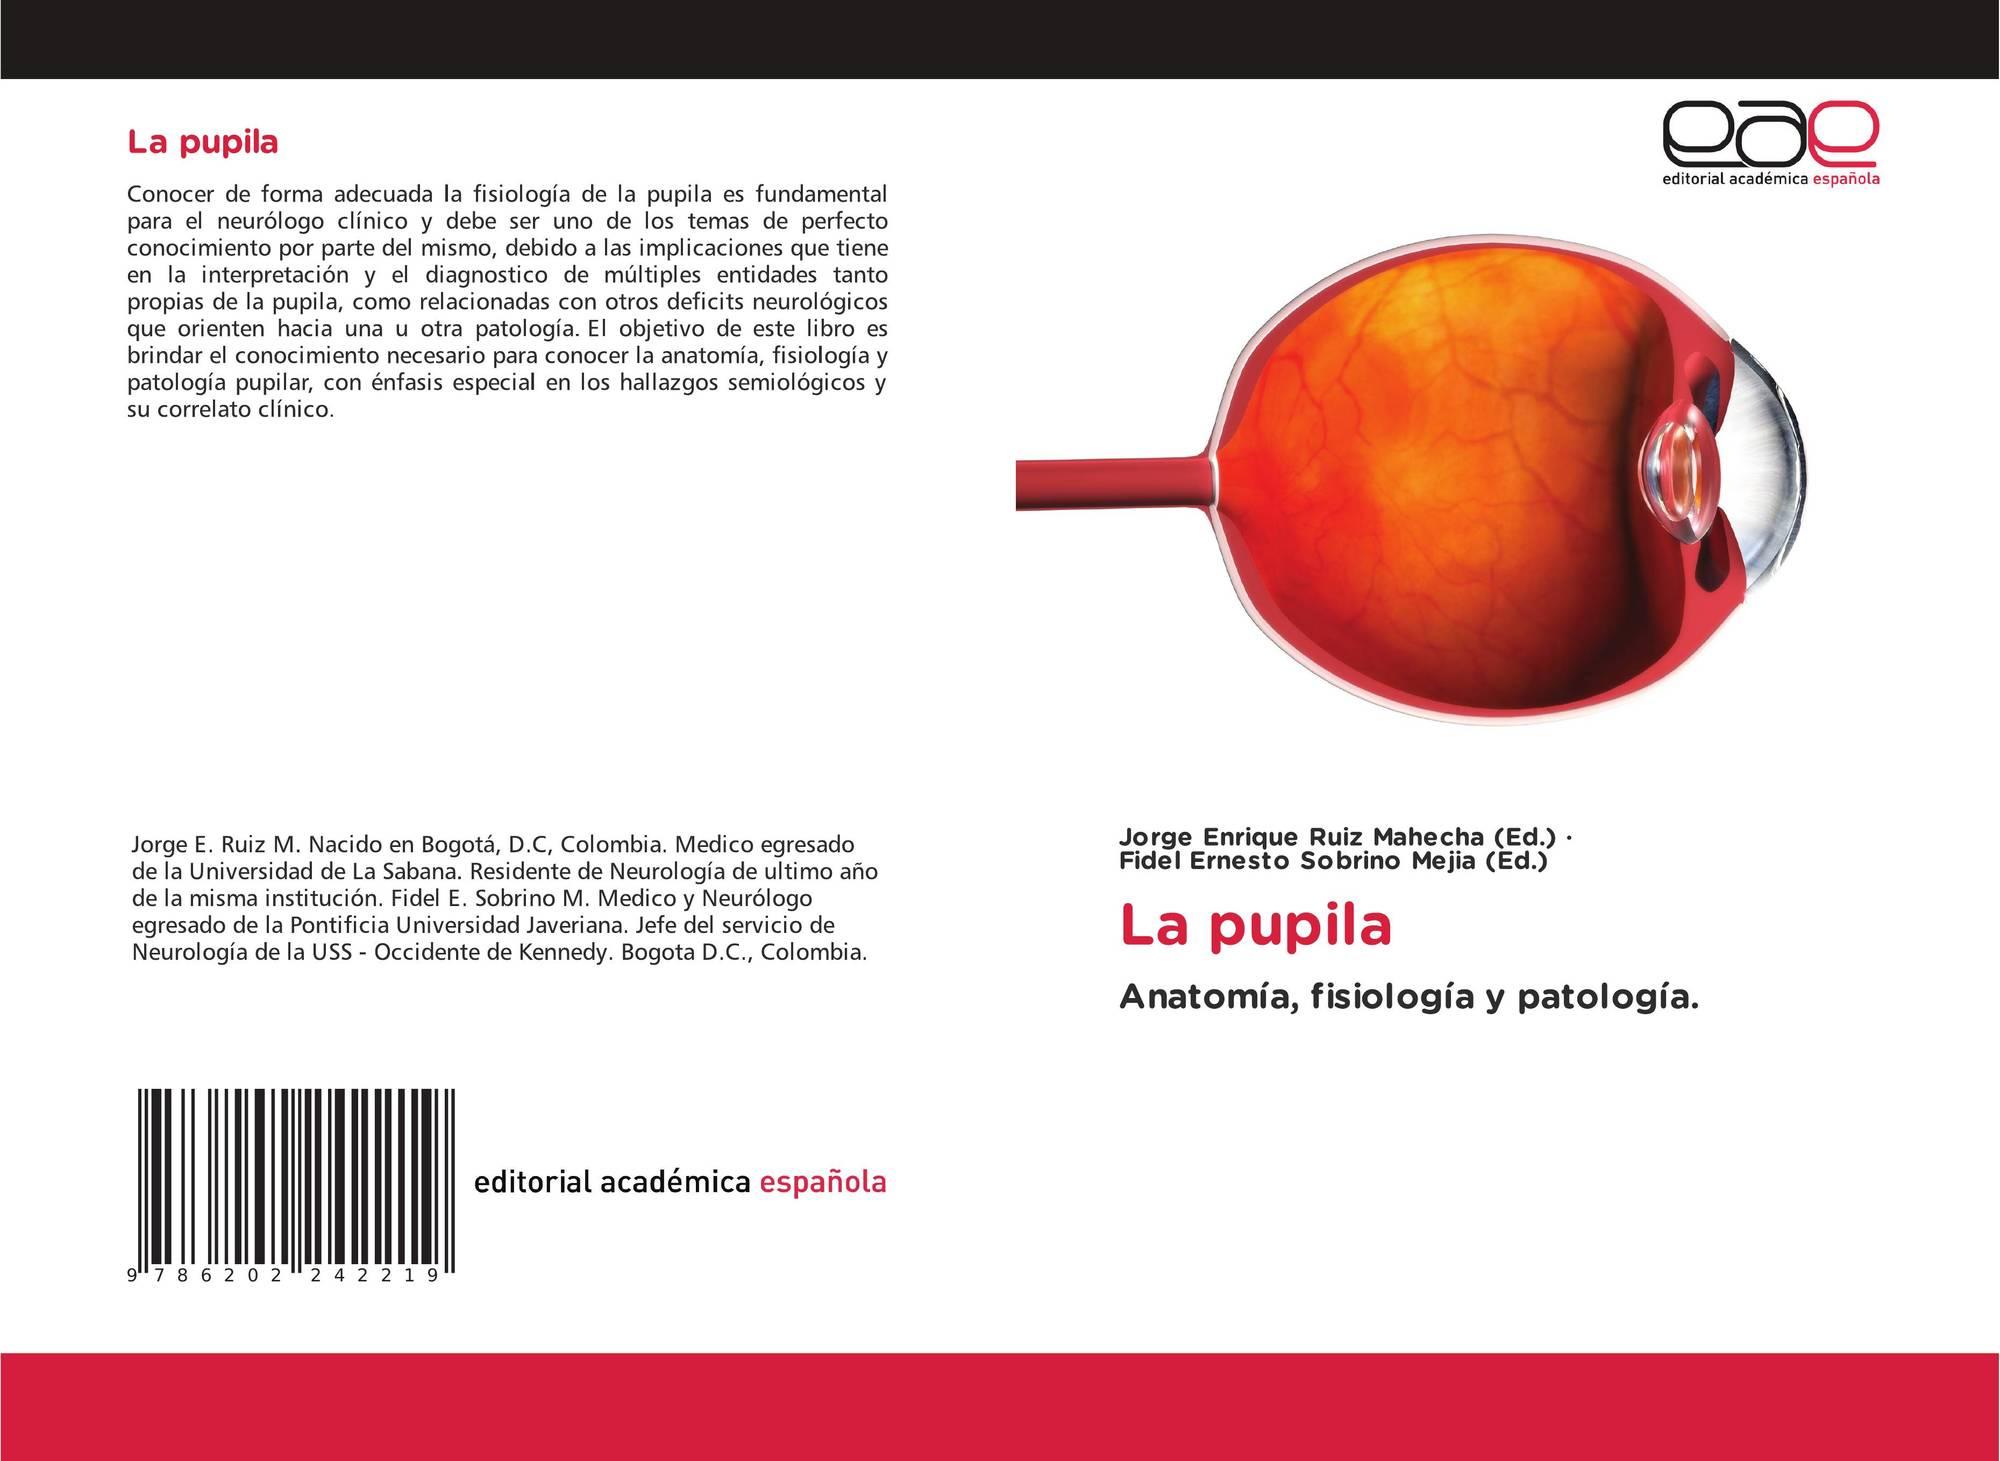 La pupila, 978-620-2-24221-9, 6202242213 ,9786202242219